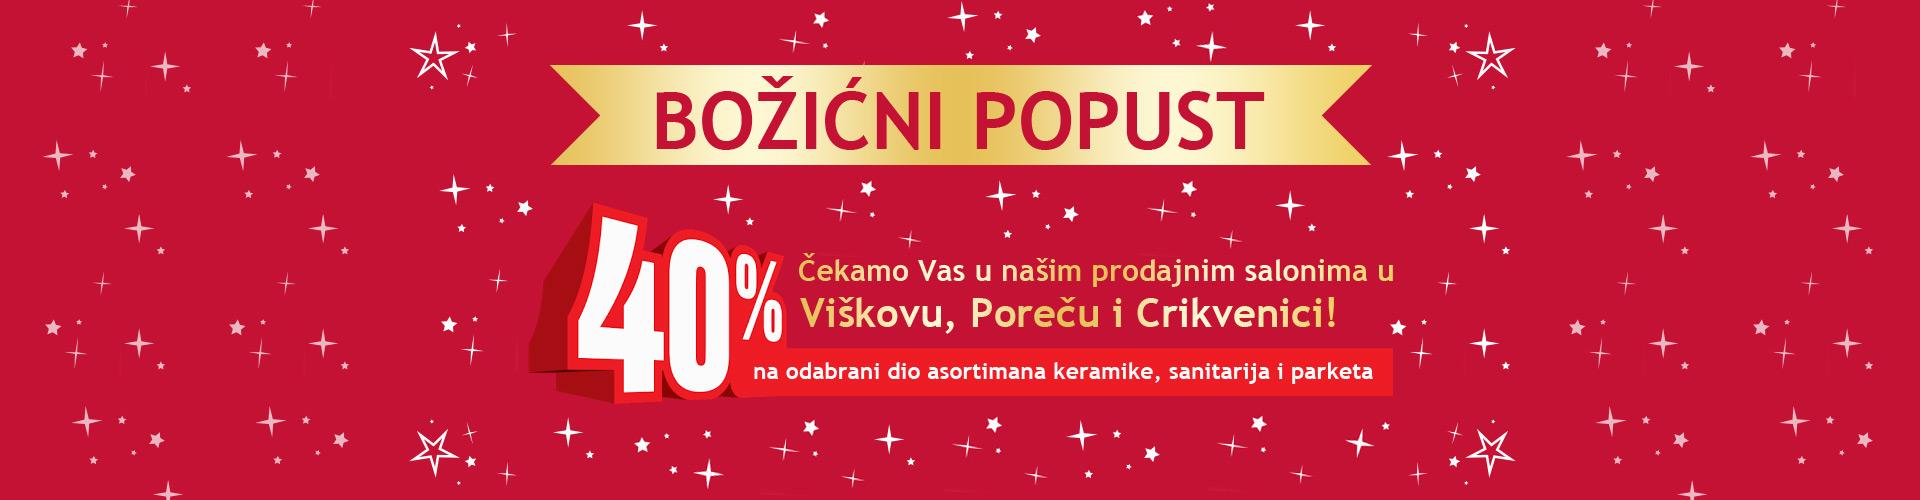 http://www.kimicommerce.hr/Repository/Banners/bozicni-popust-banner-122016-02.jpg